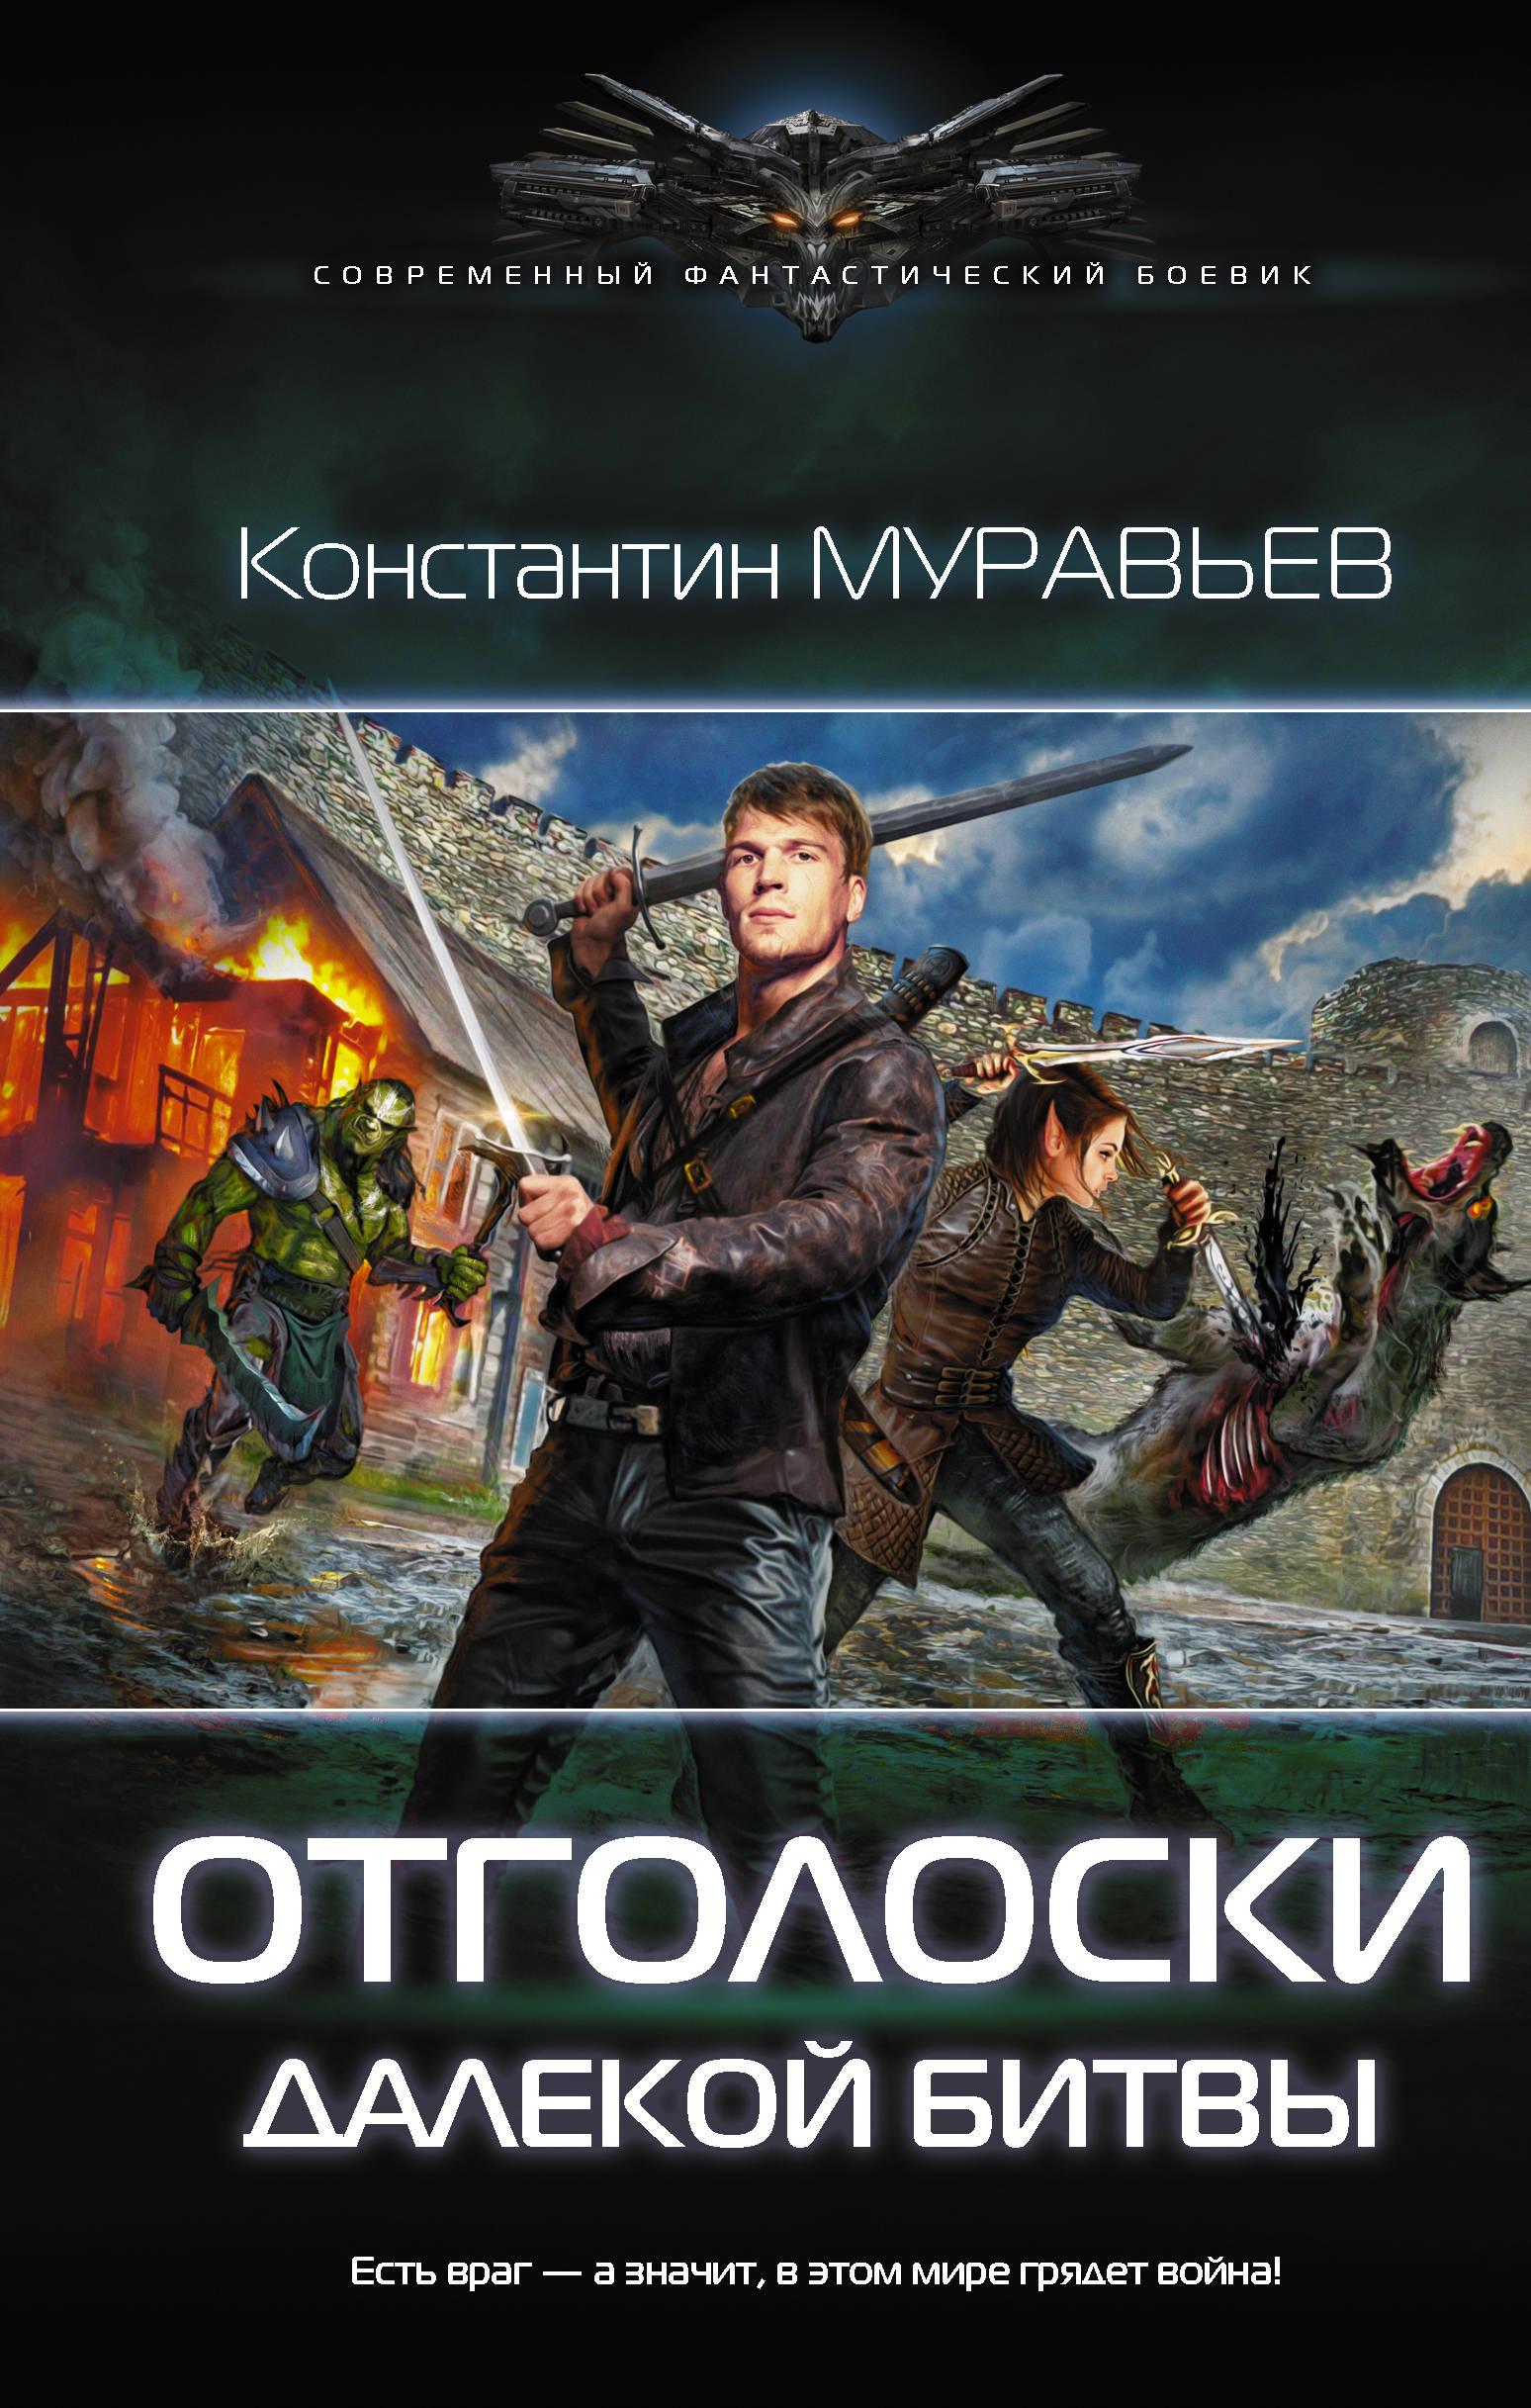 Константин Муравьёв «Отголоски далёкой битвы»